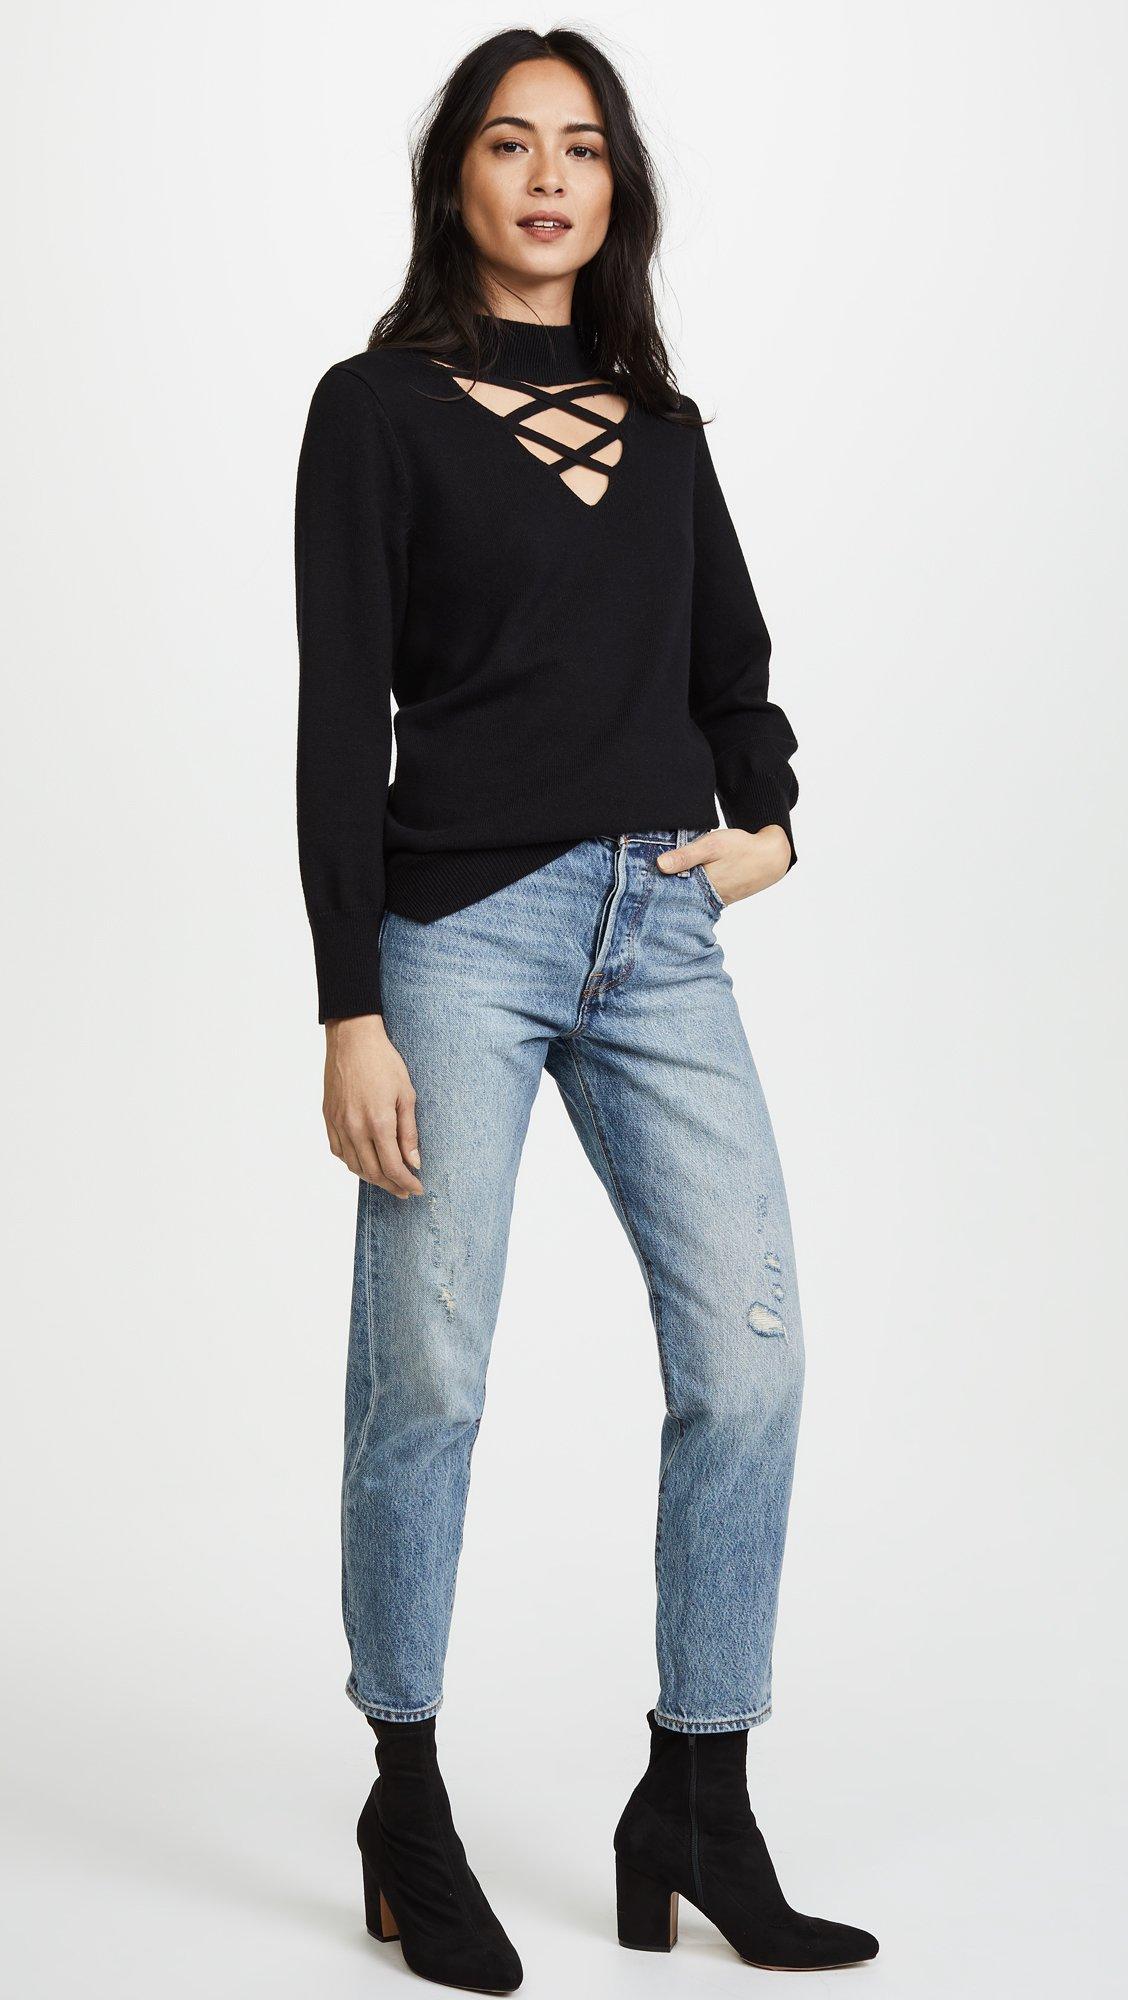 LNA Women's Joey Detached Sweater, Black, Small by LNA (Image #5)